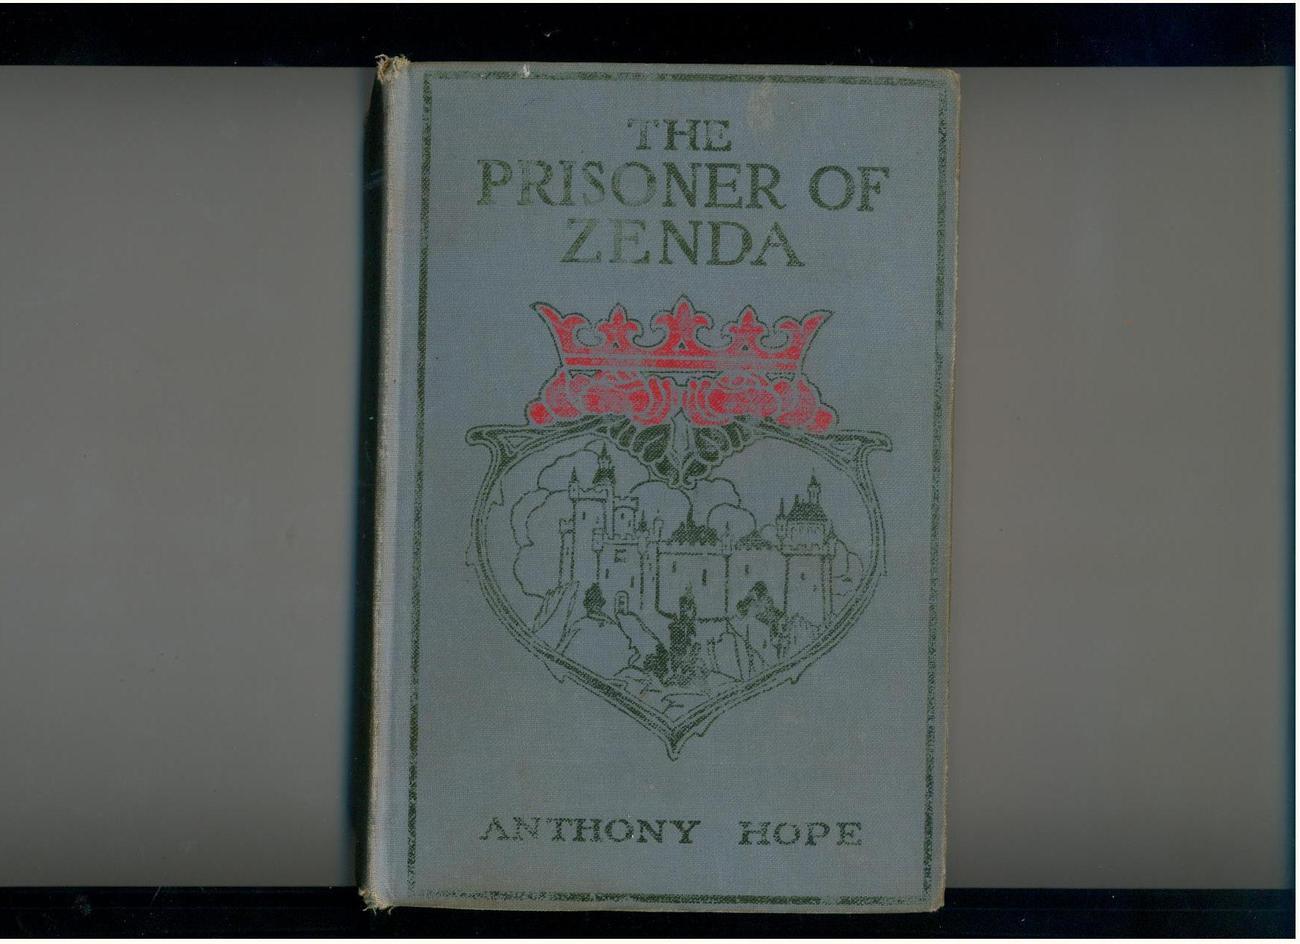 Hope - THE PRISONER OF ZENDA - vintage reprint